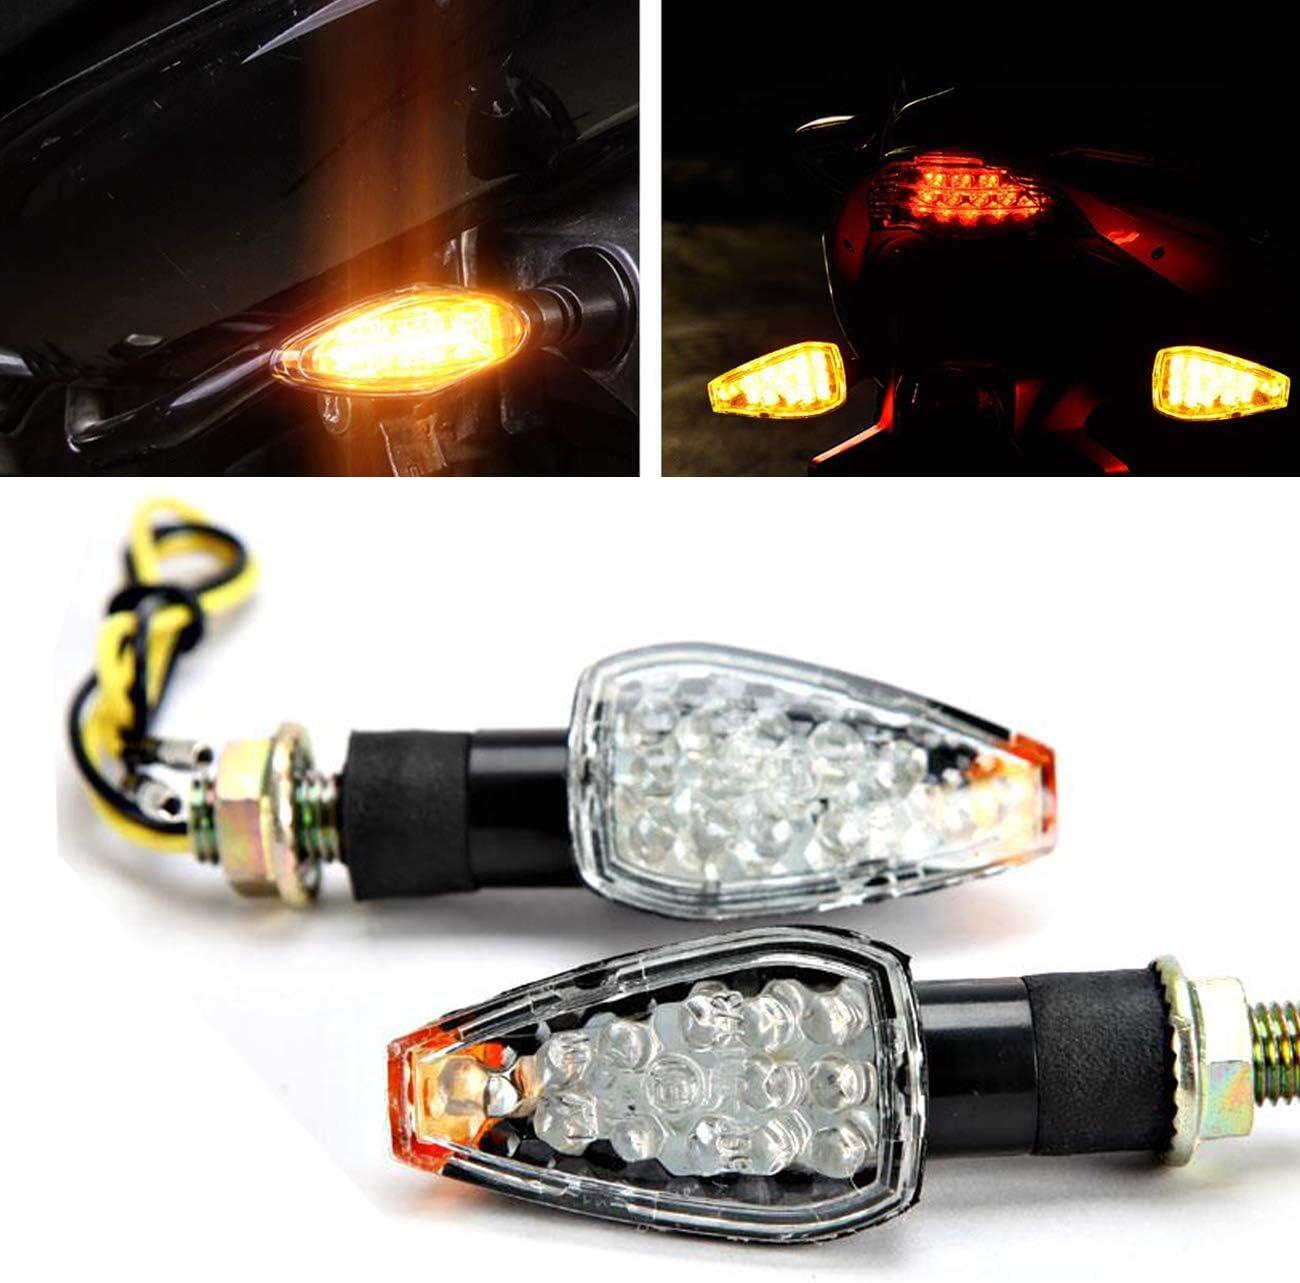 4Pcs Motorcycle Motorbike Smoke 14 LED Turn Signal Amber Lights Lamp Indicators